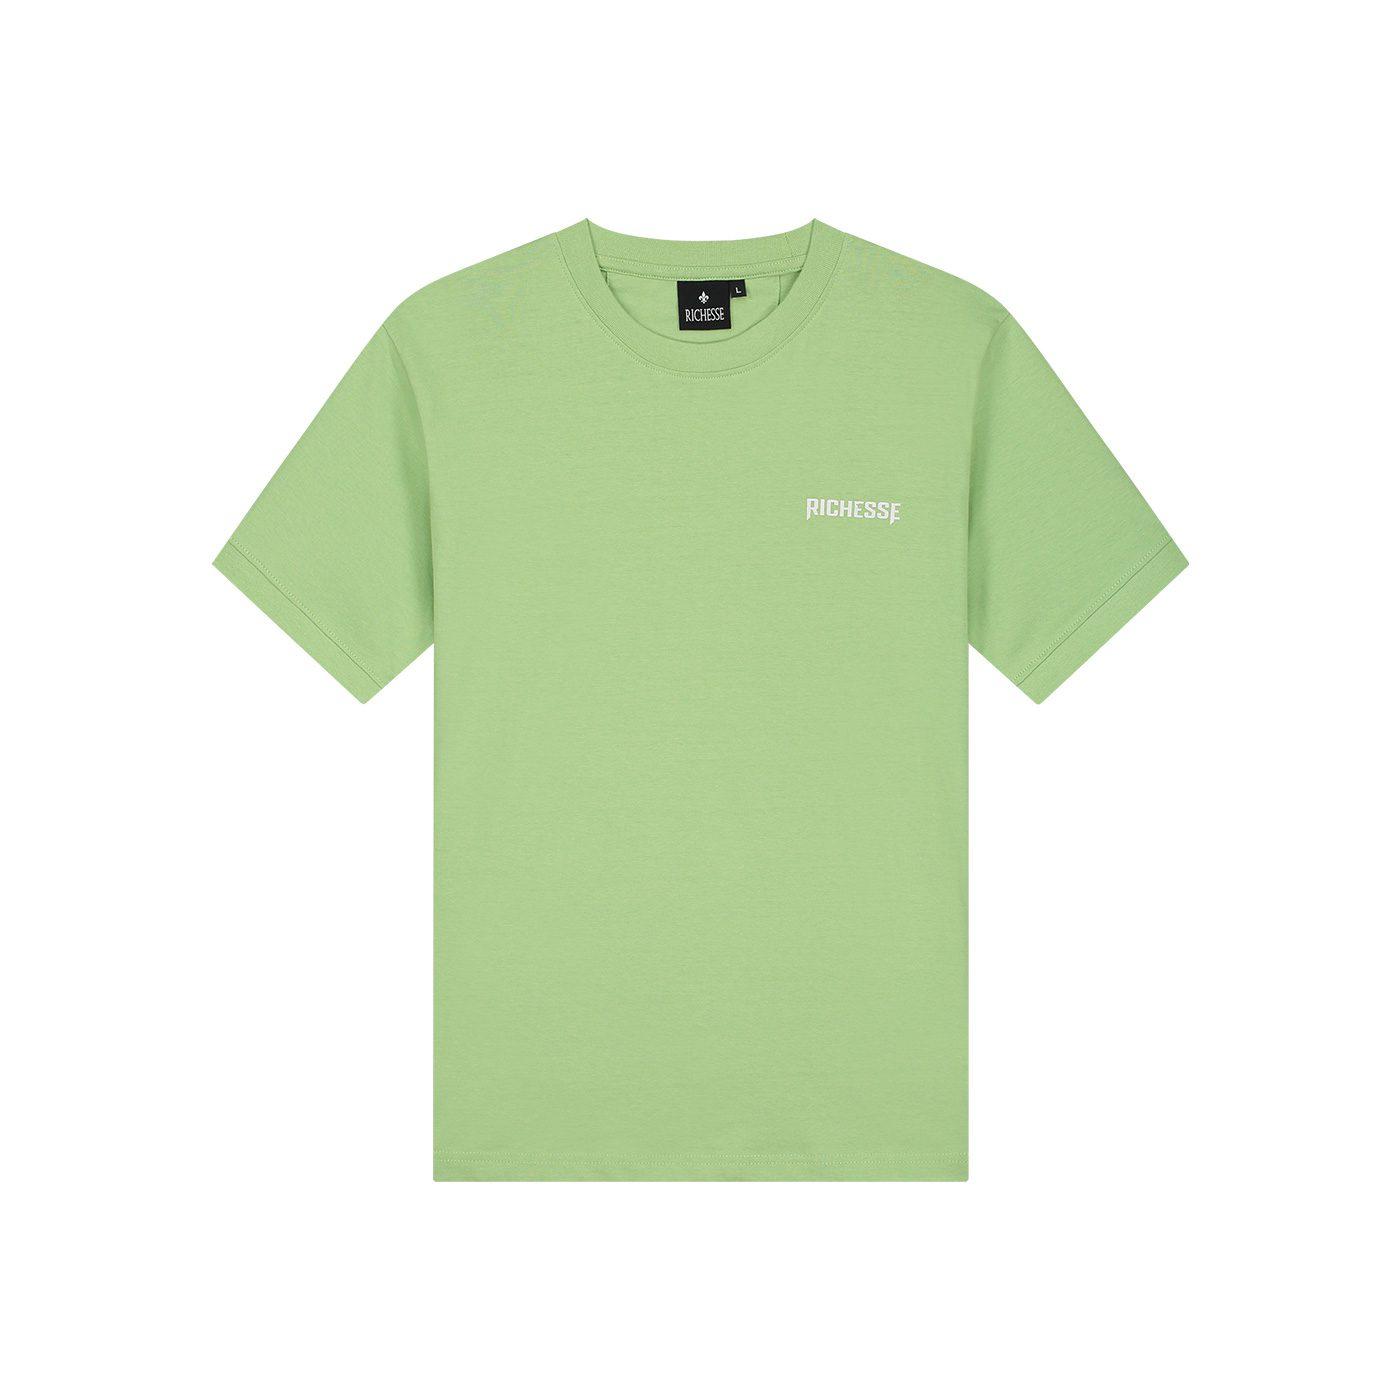 Promised-Green-T-shirt